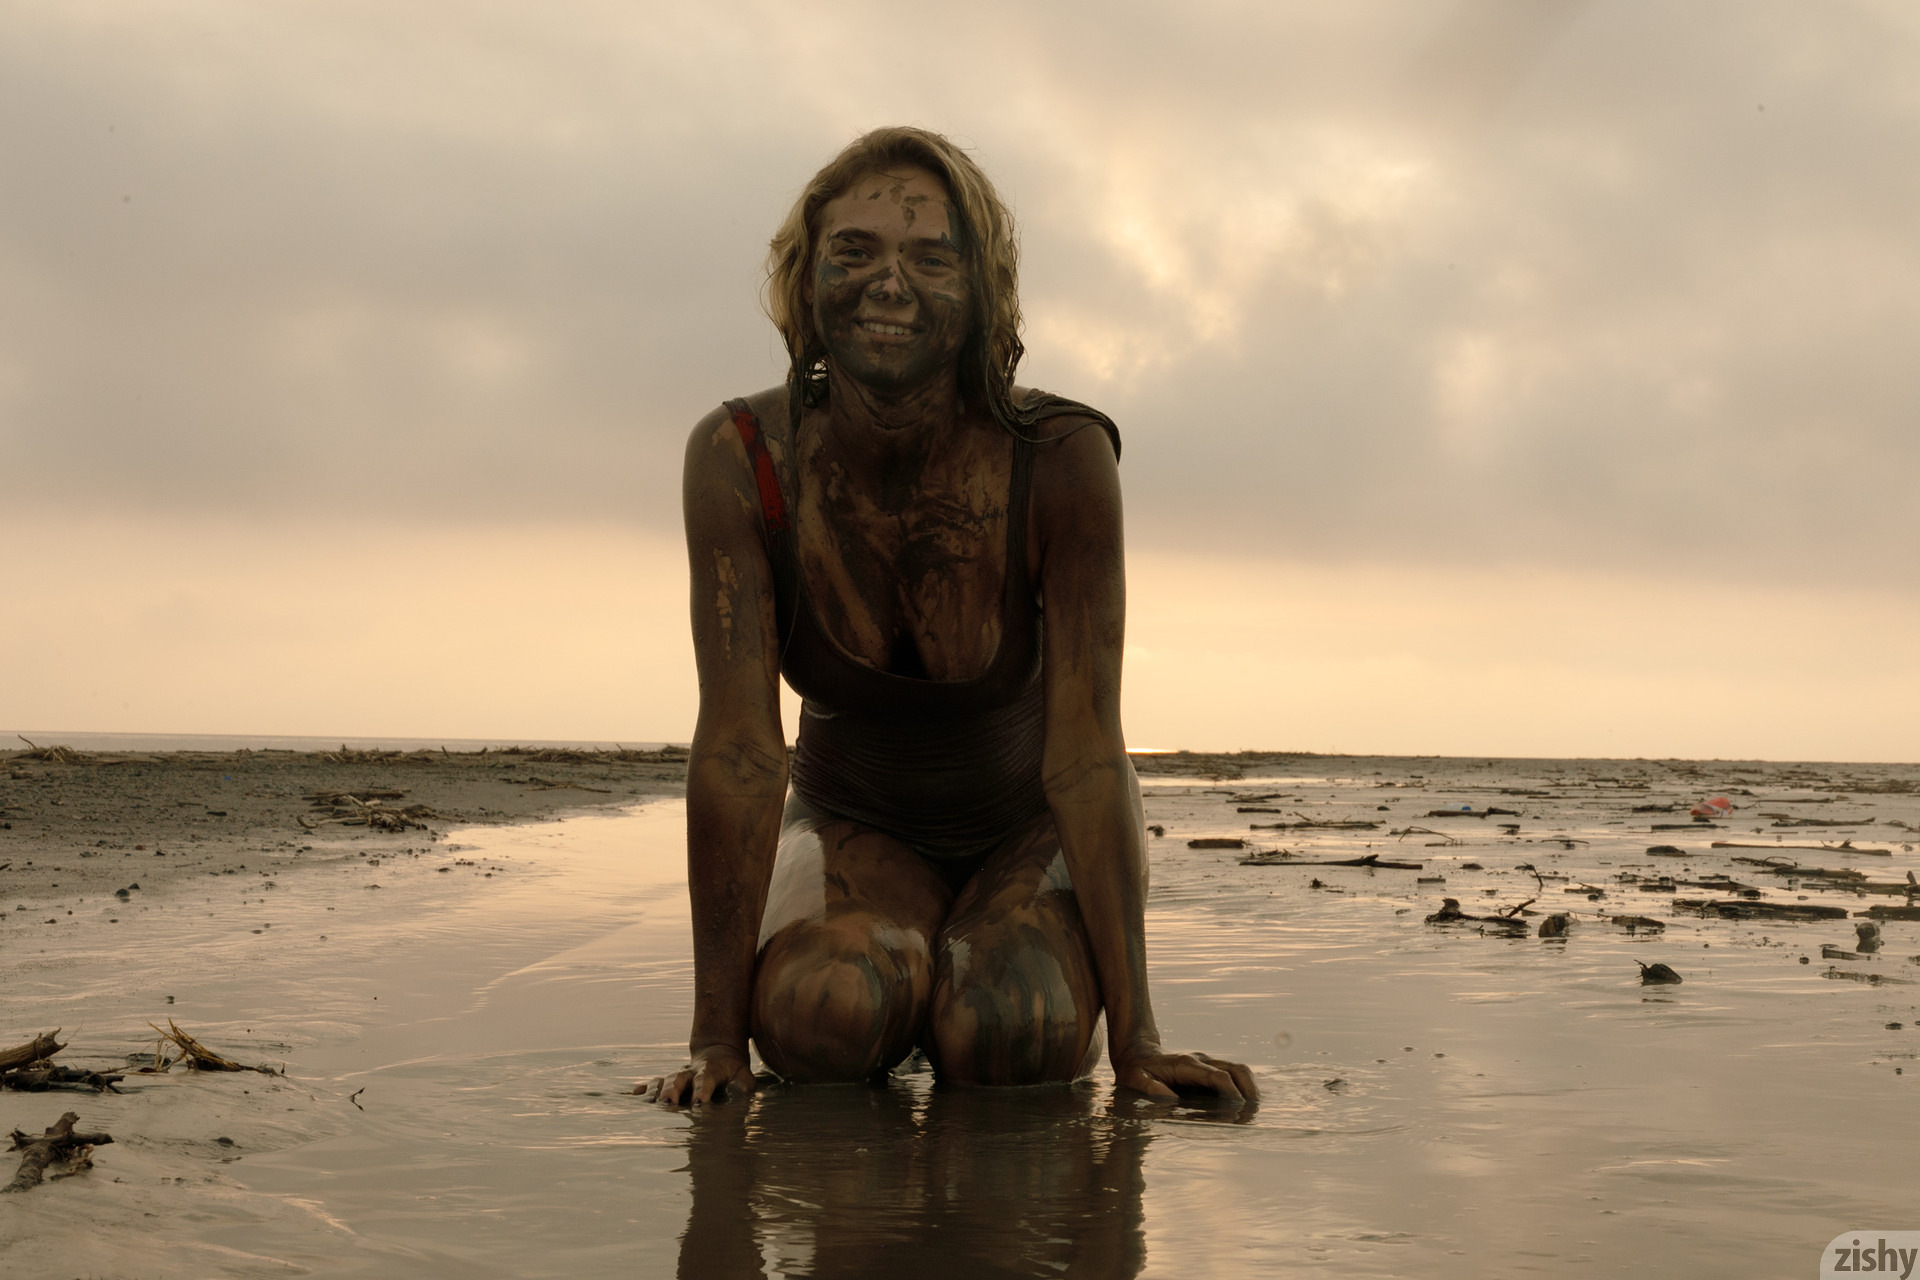 Sofia Orlova On Gryaznyy Beach Zishy (47)